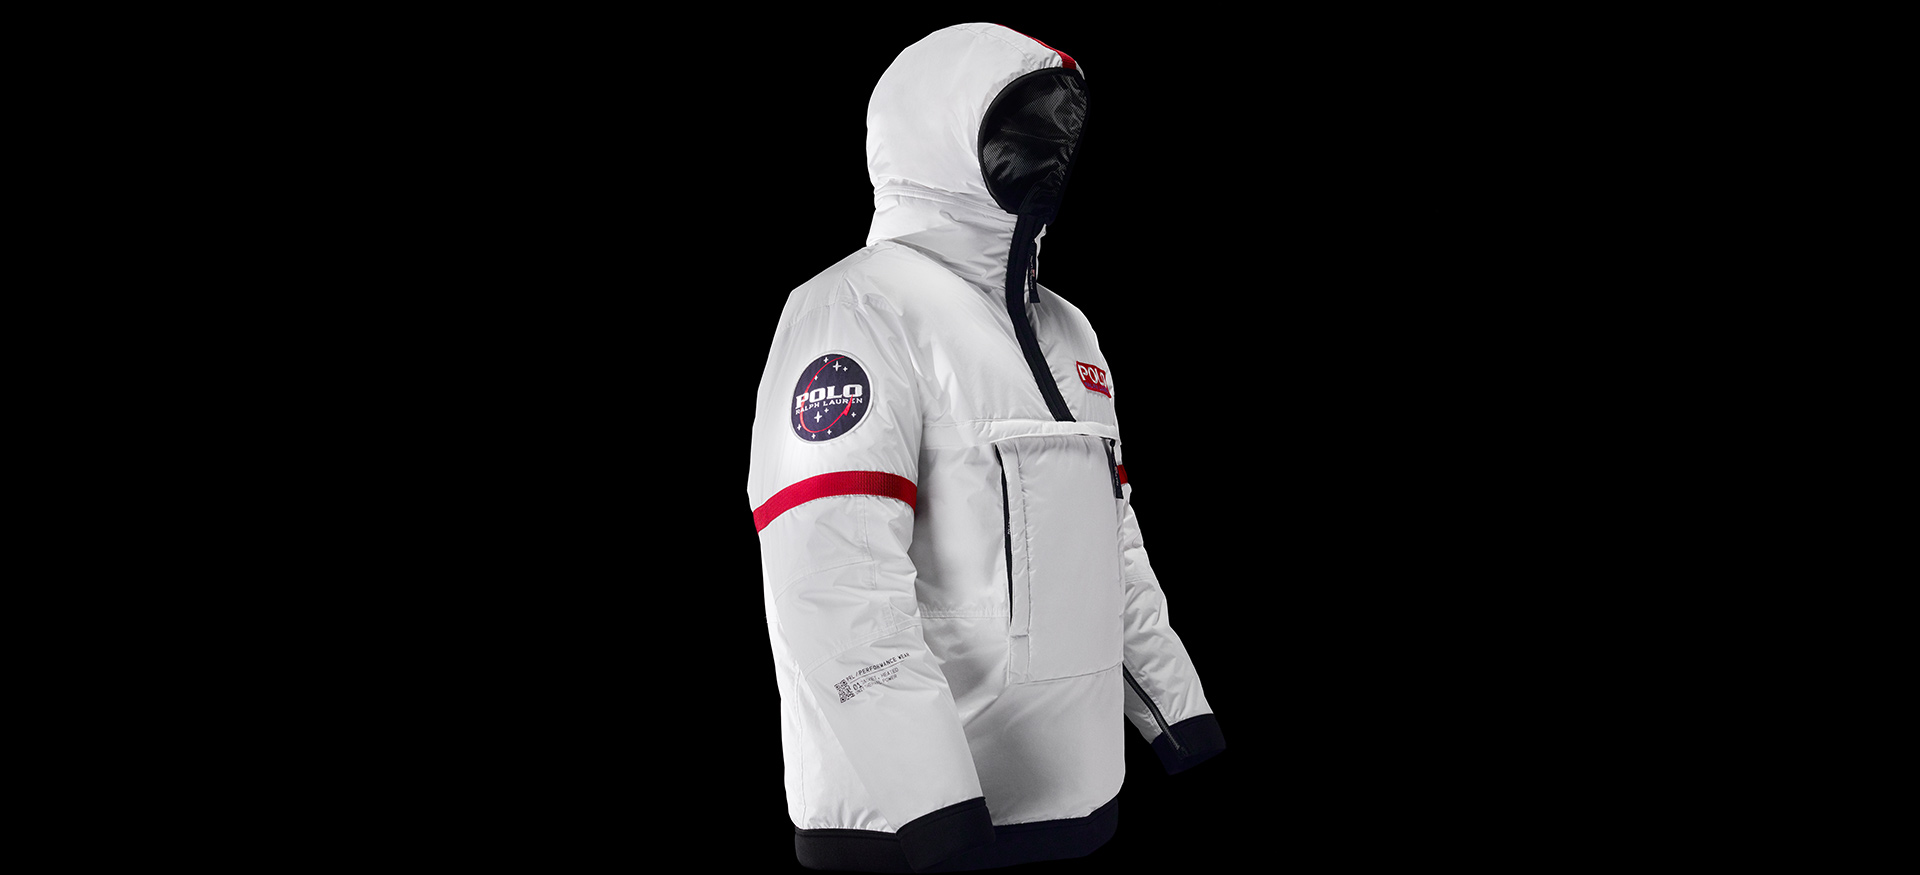 Photograph of hooded white RL Heat jacket against black background